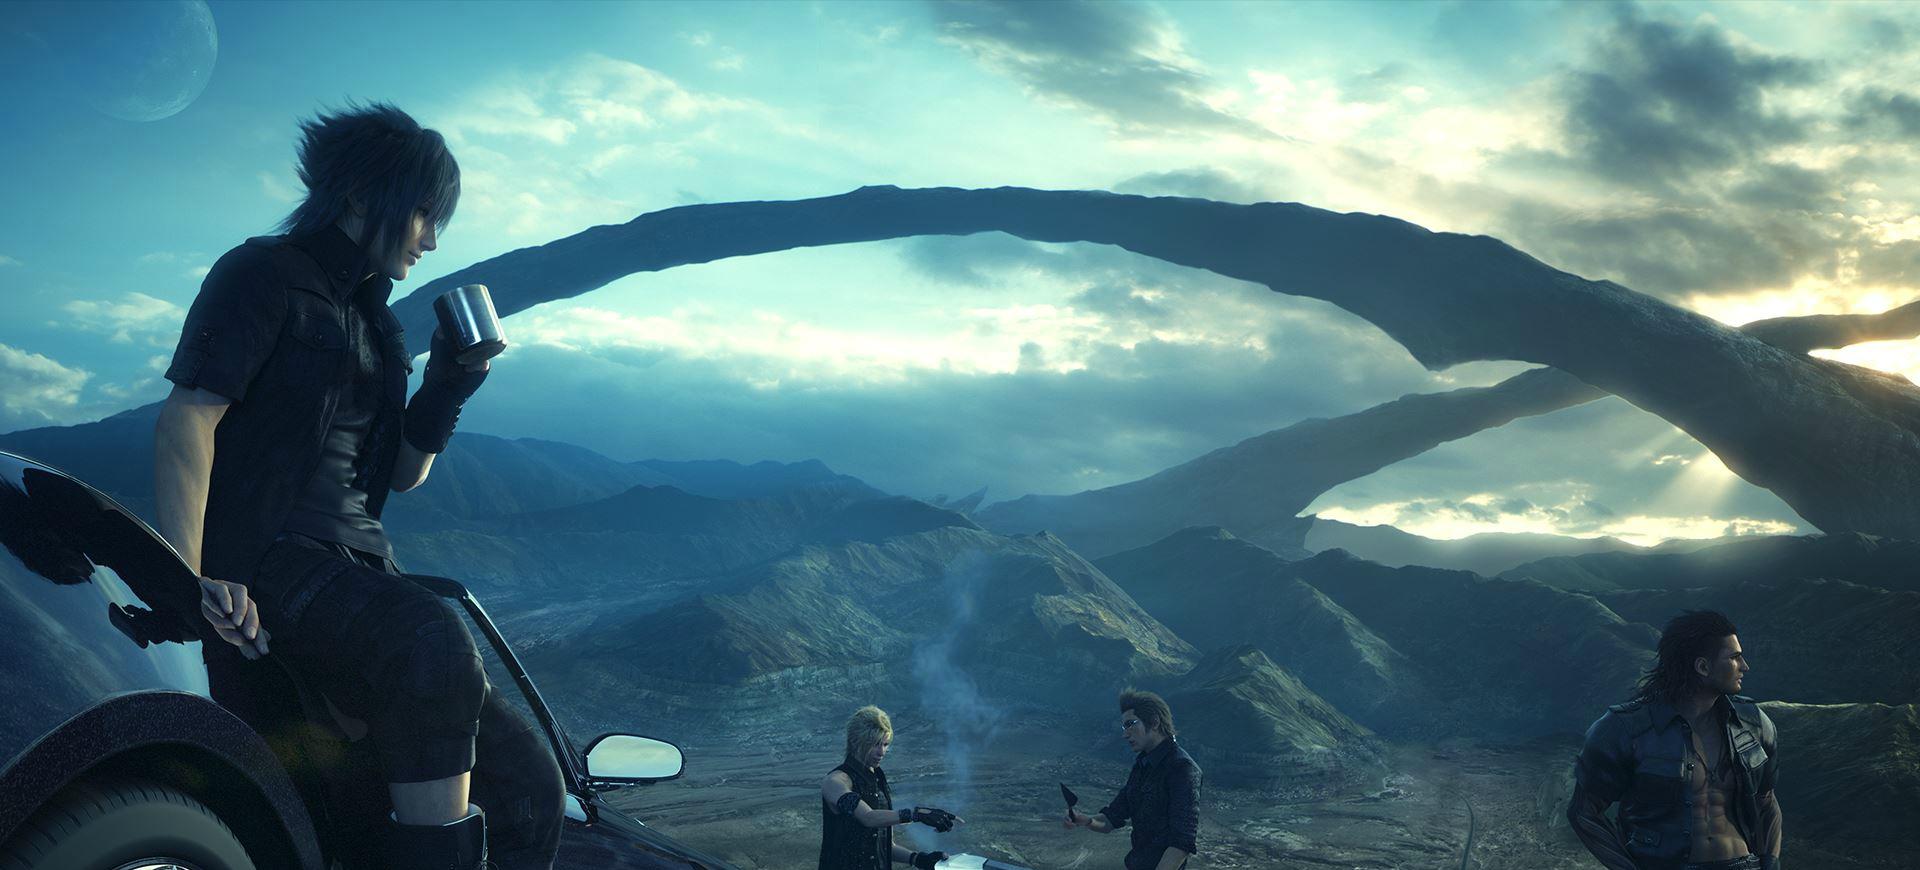 Final Fantasy XV ra mắt trailer mới – Tin Game